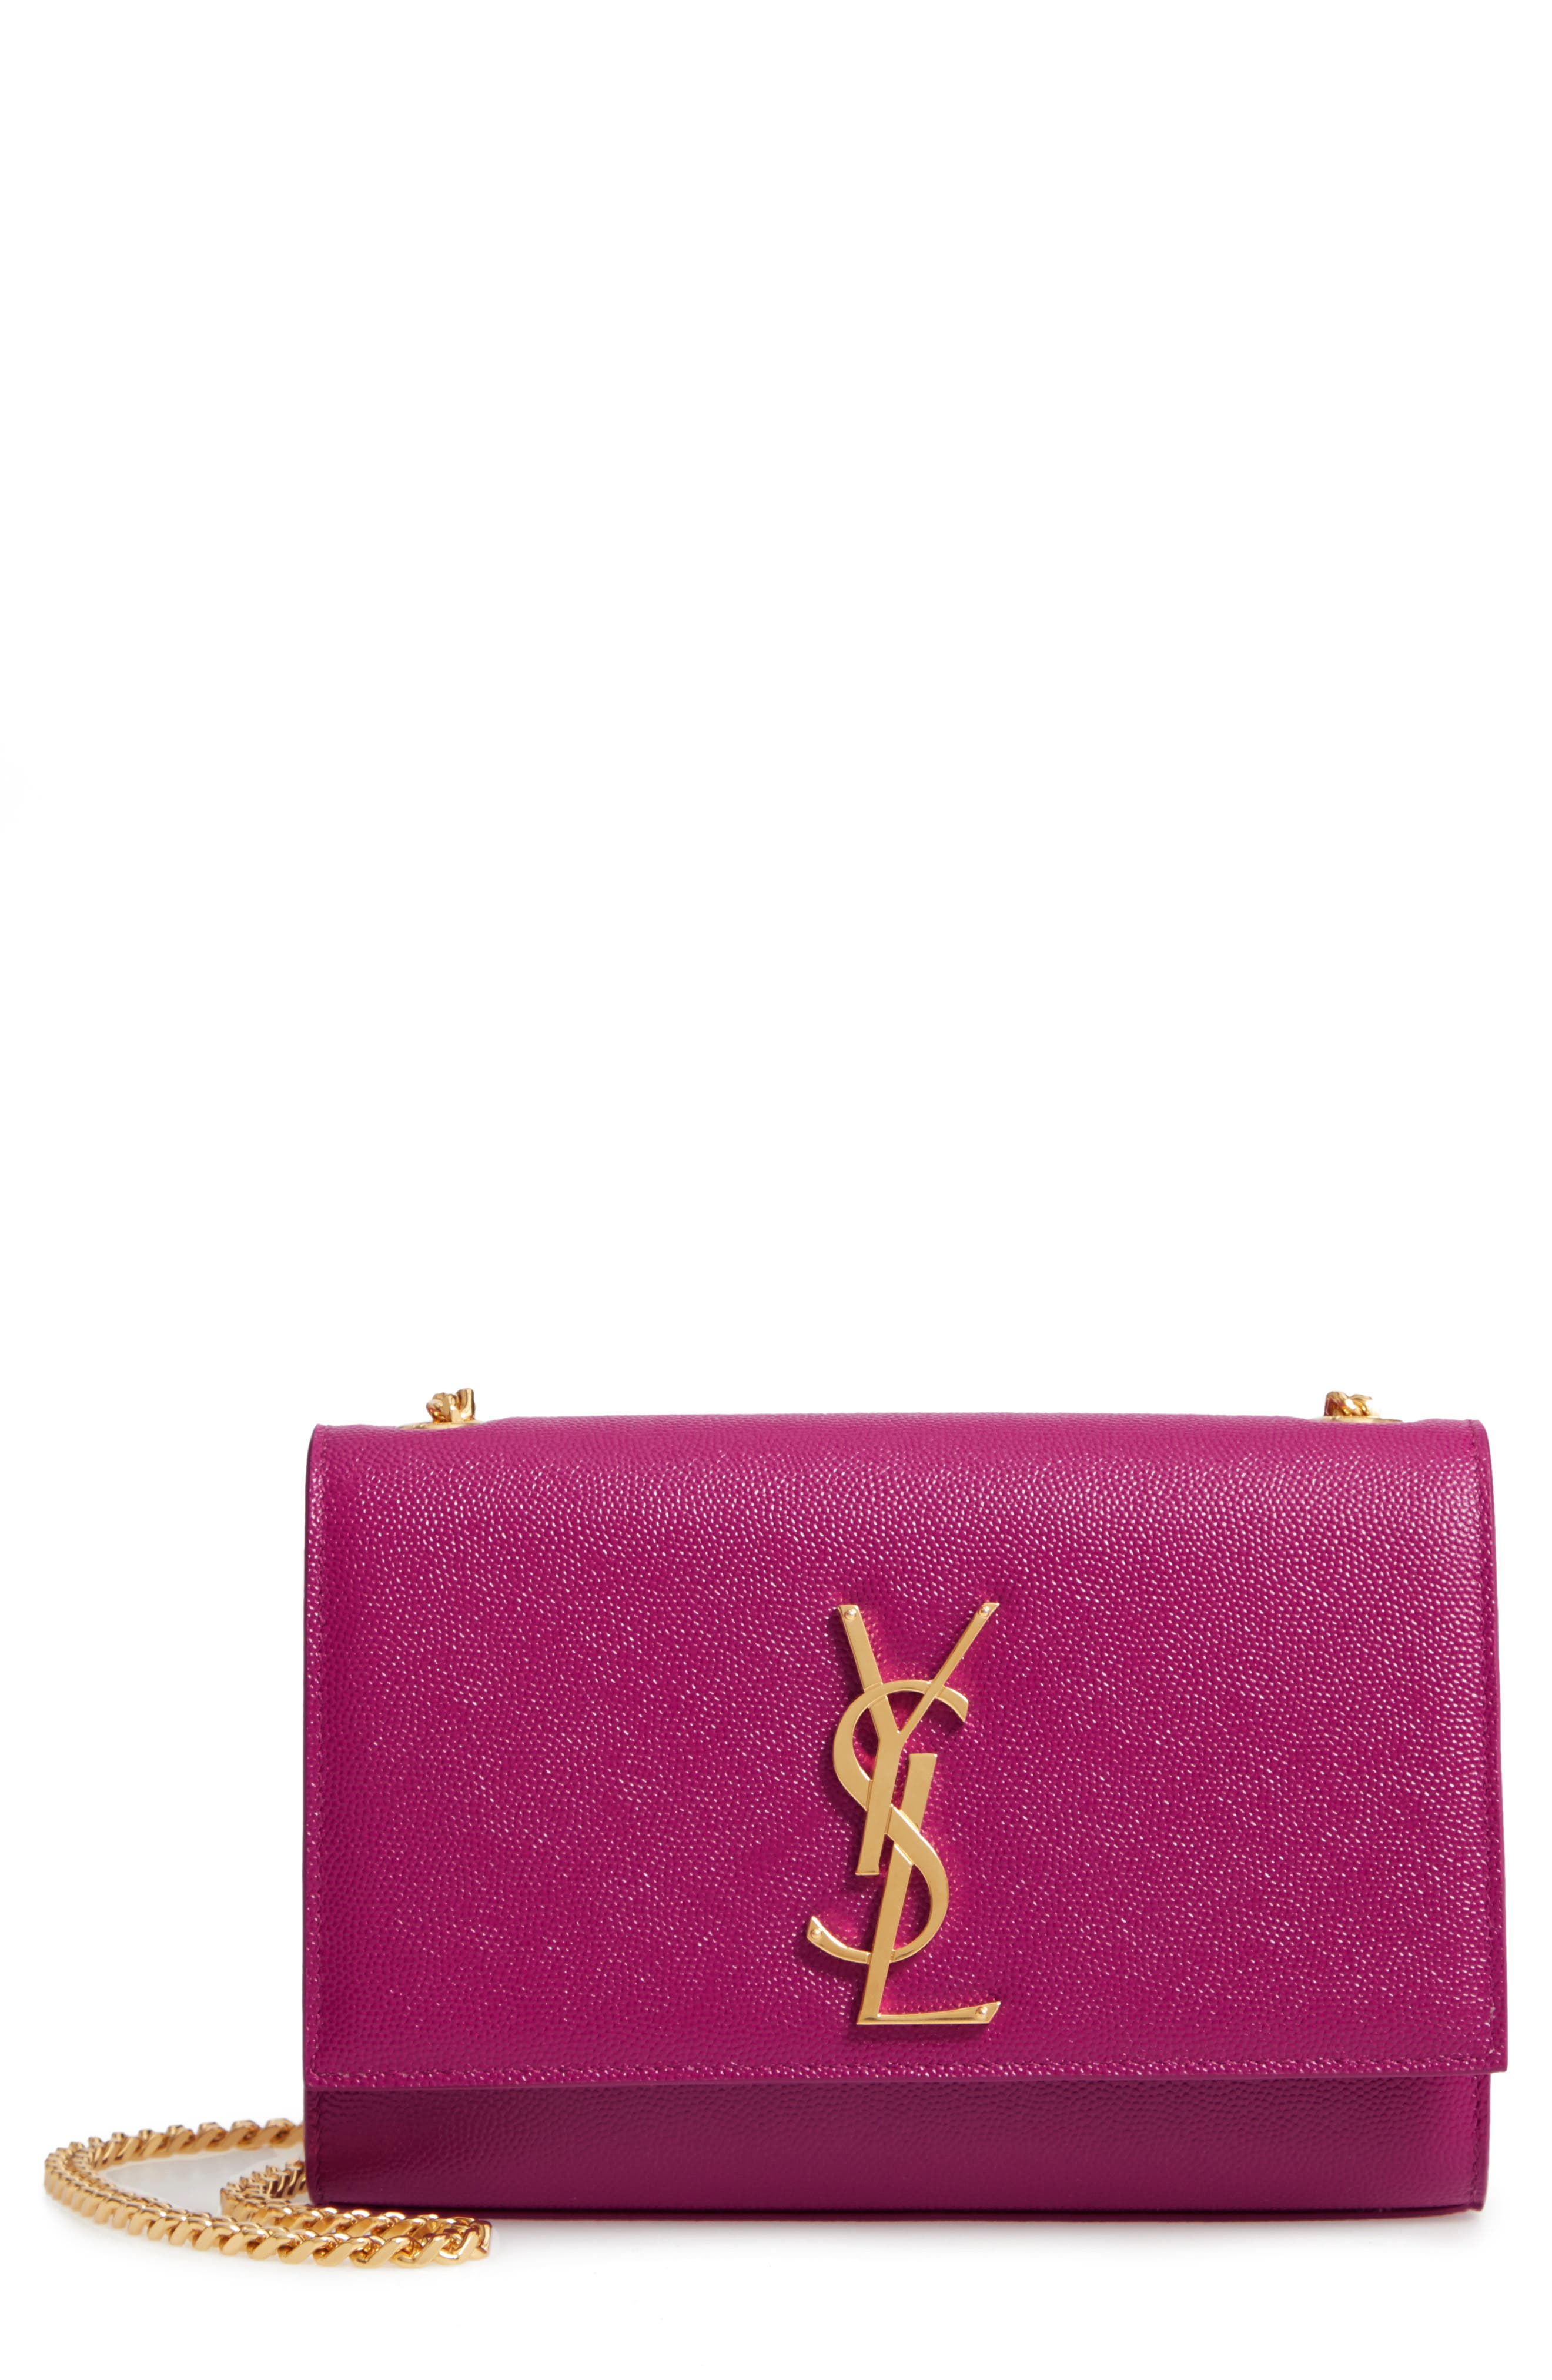 SAINT LAURENT Small Kate Chain Crossbody Bag, Main, color, LIGHT GRAPE